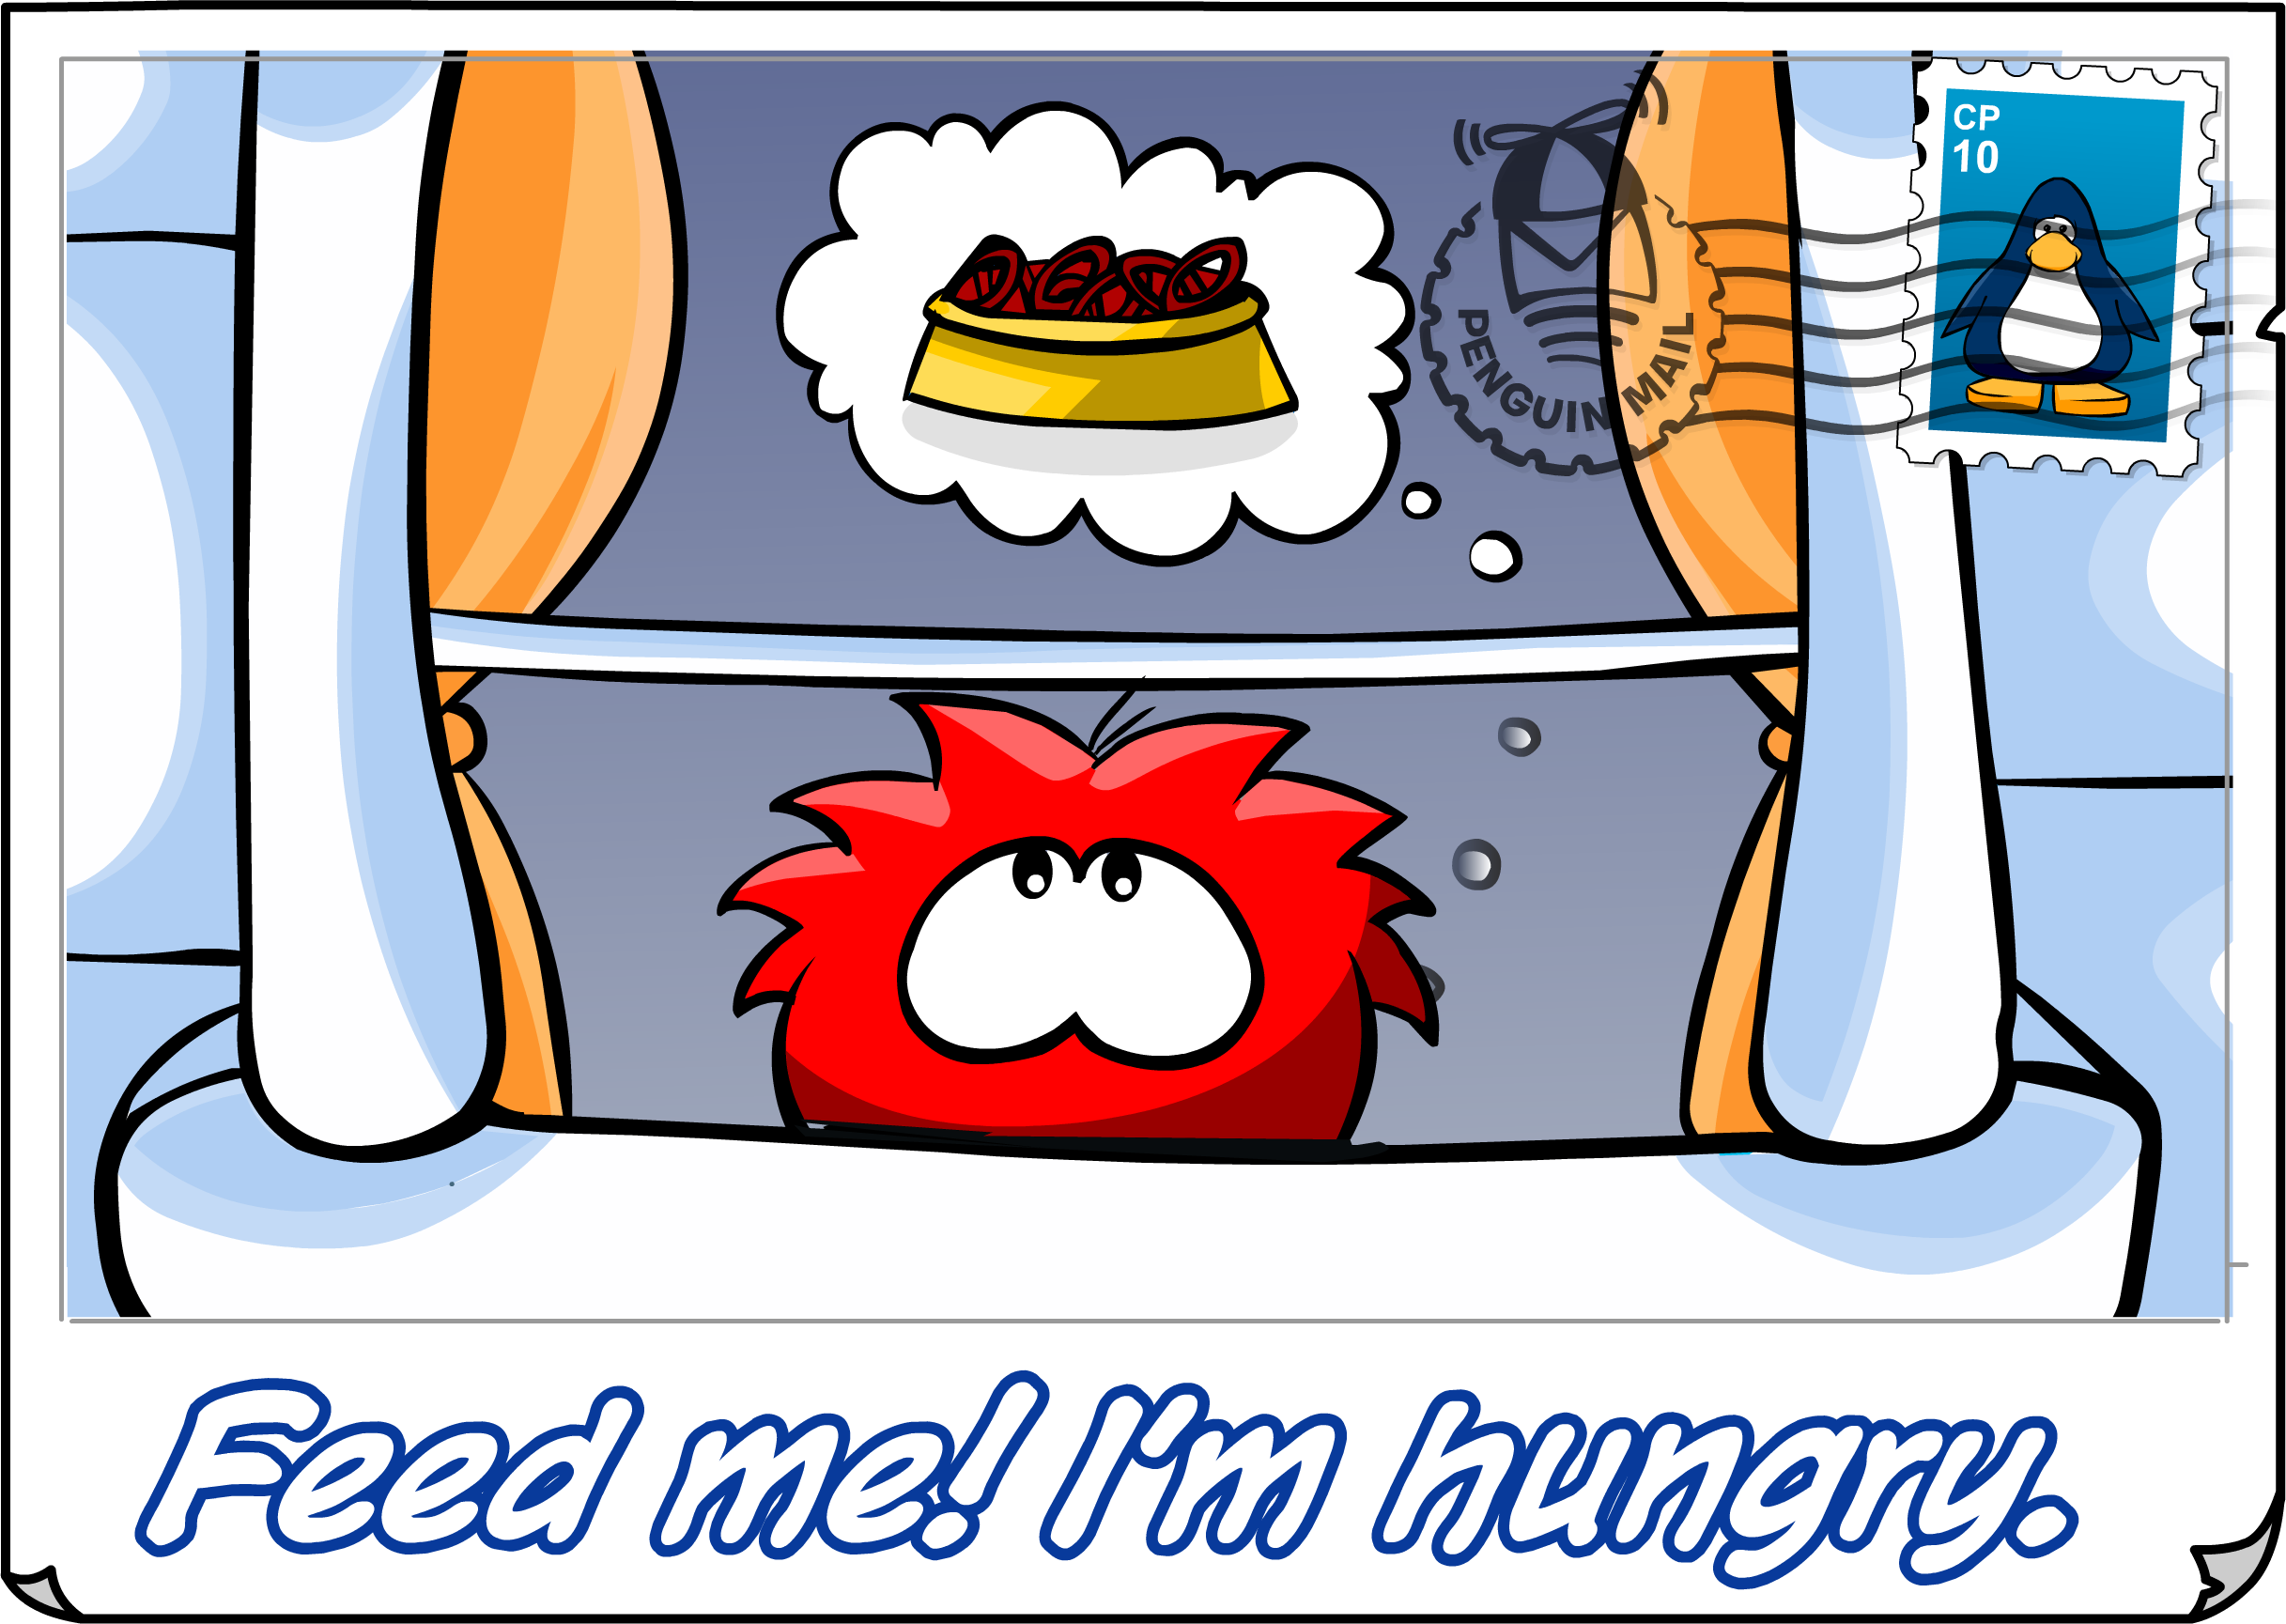 Feed Me Postcard